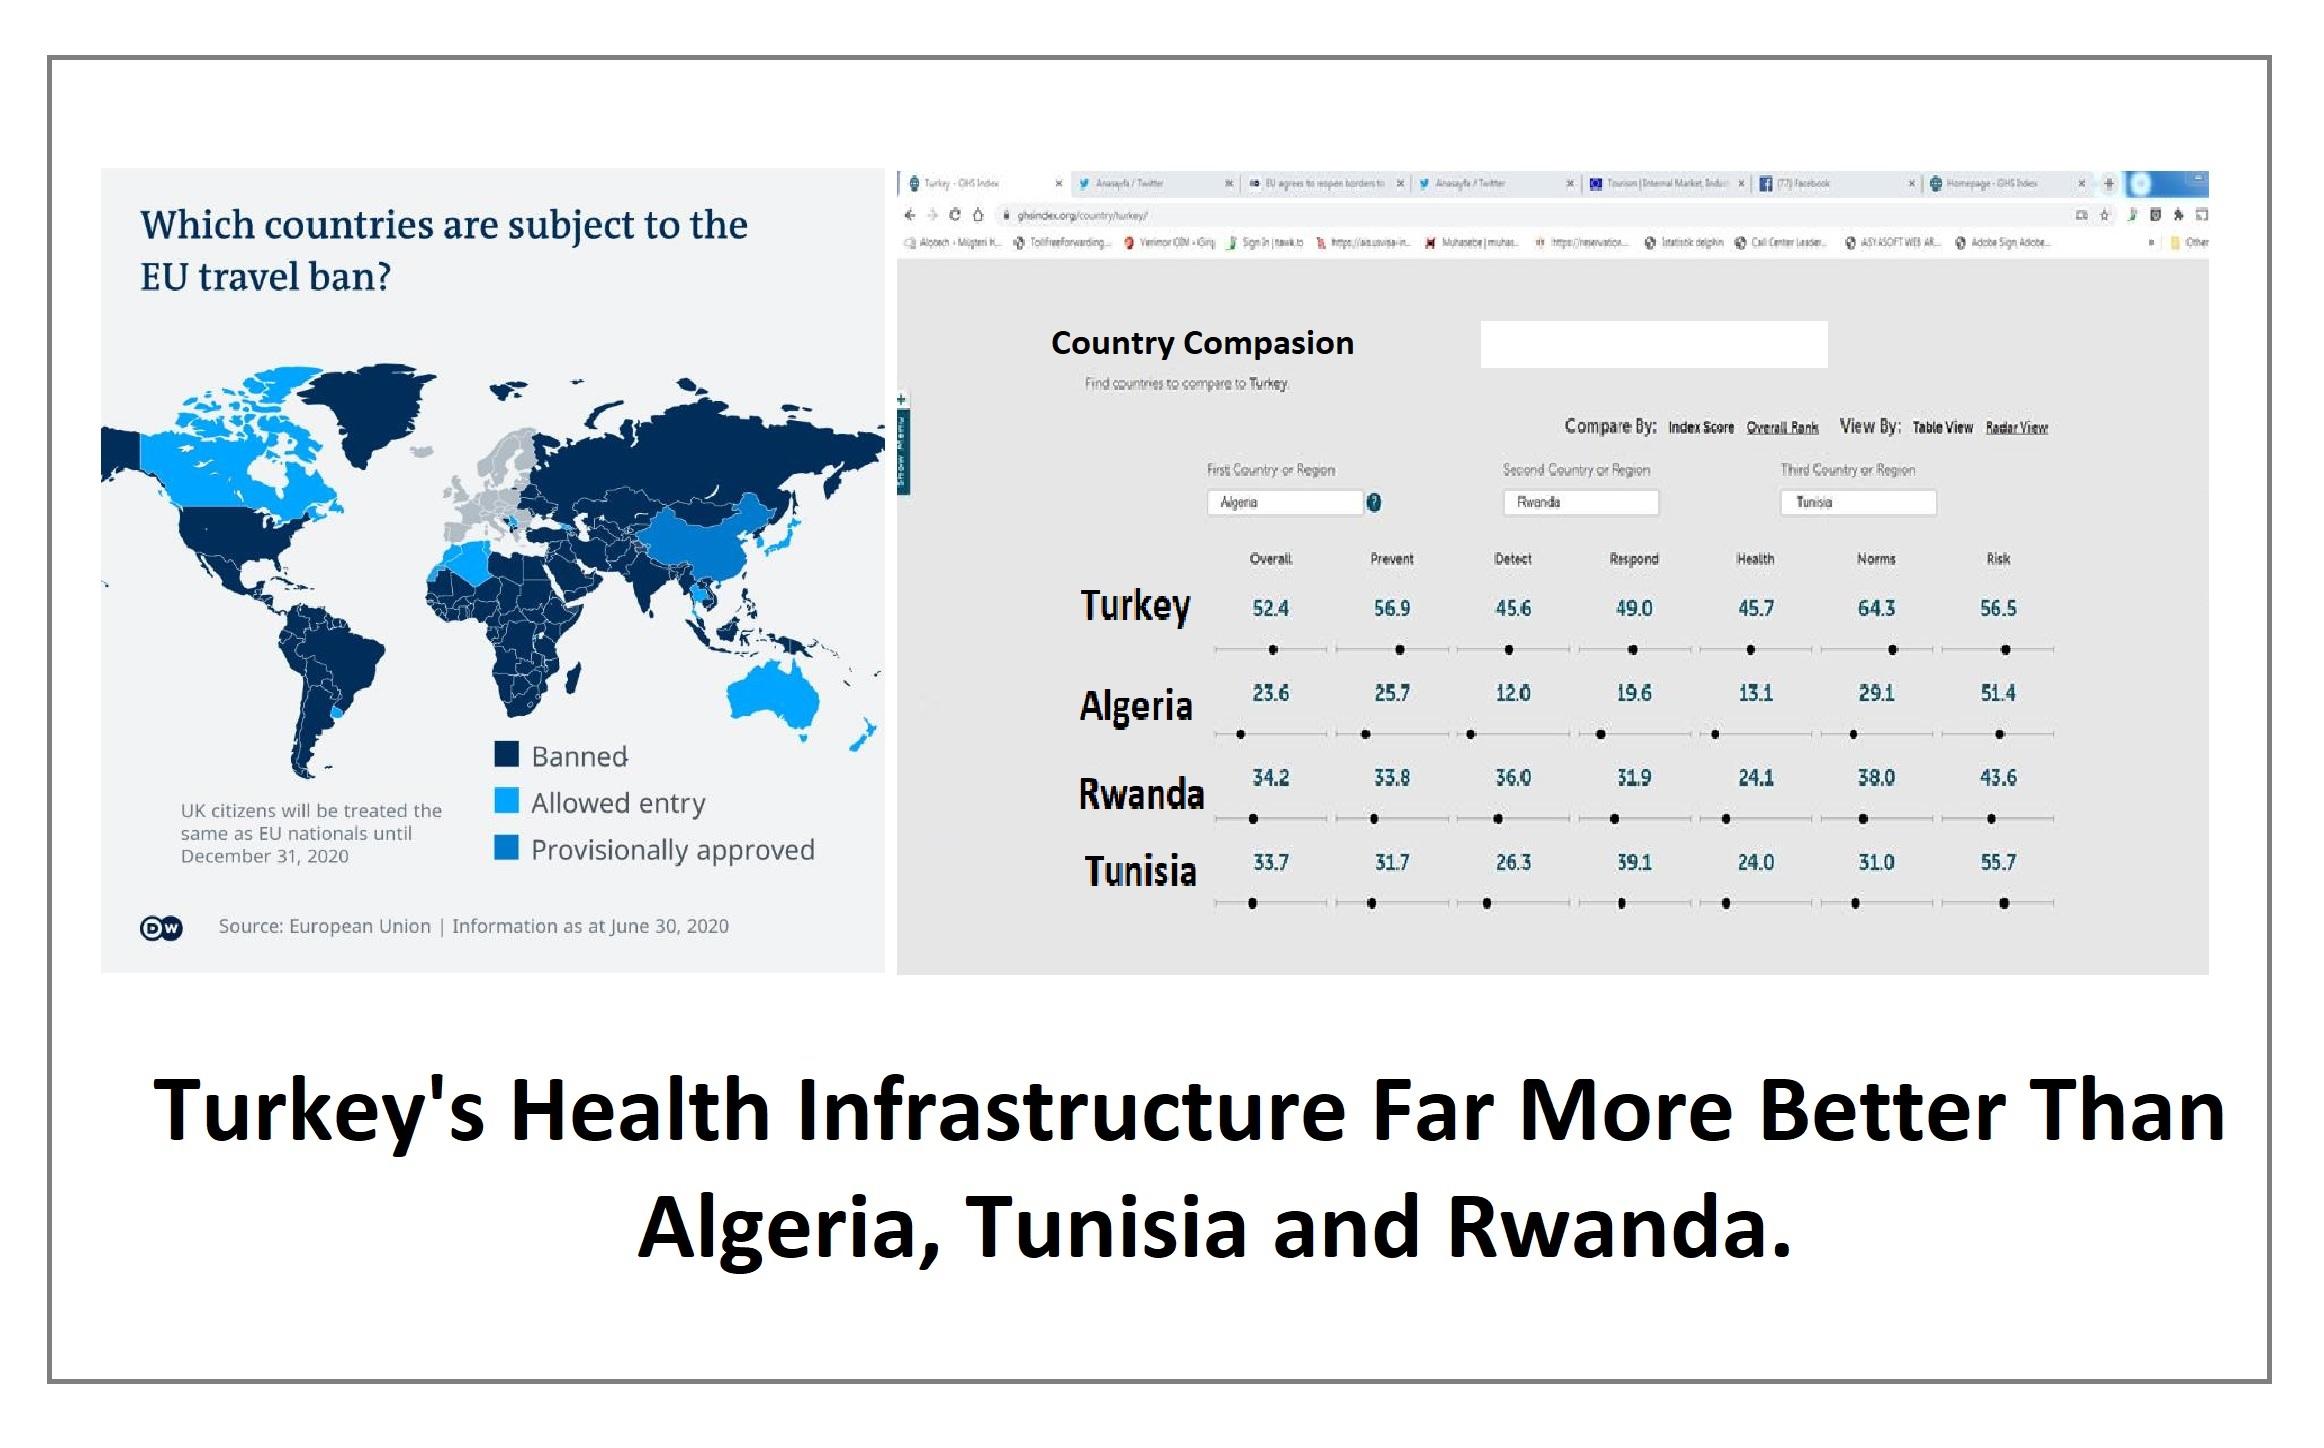 Turkey's Health Infrastructure Far More Better Than                      Algeria, Tunisia and Rwanda.